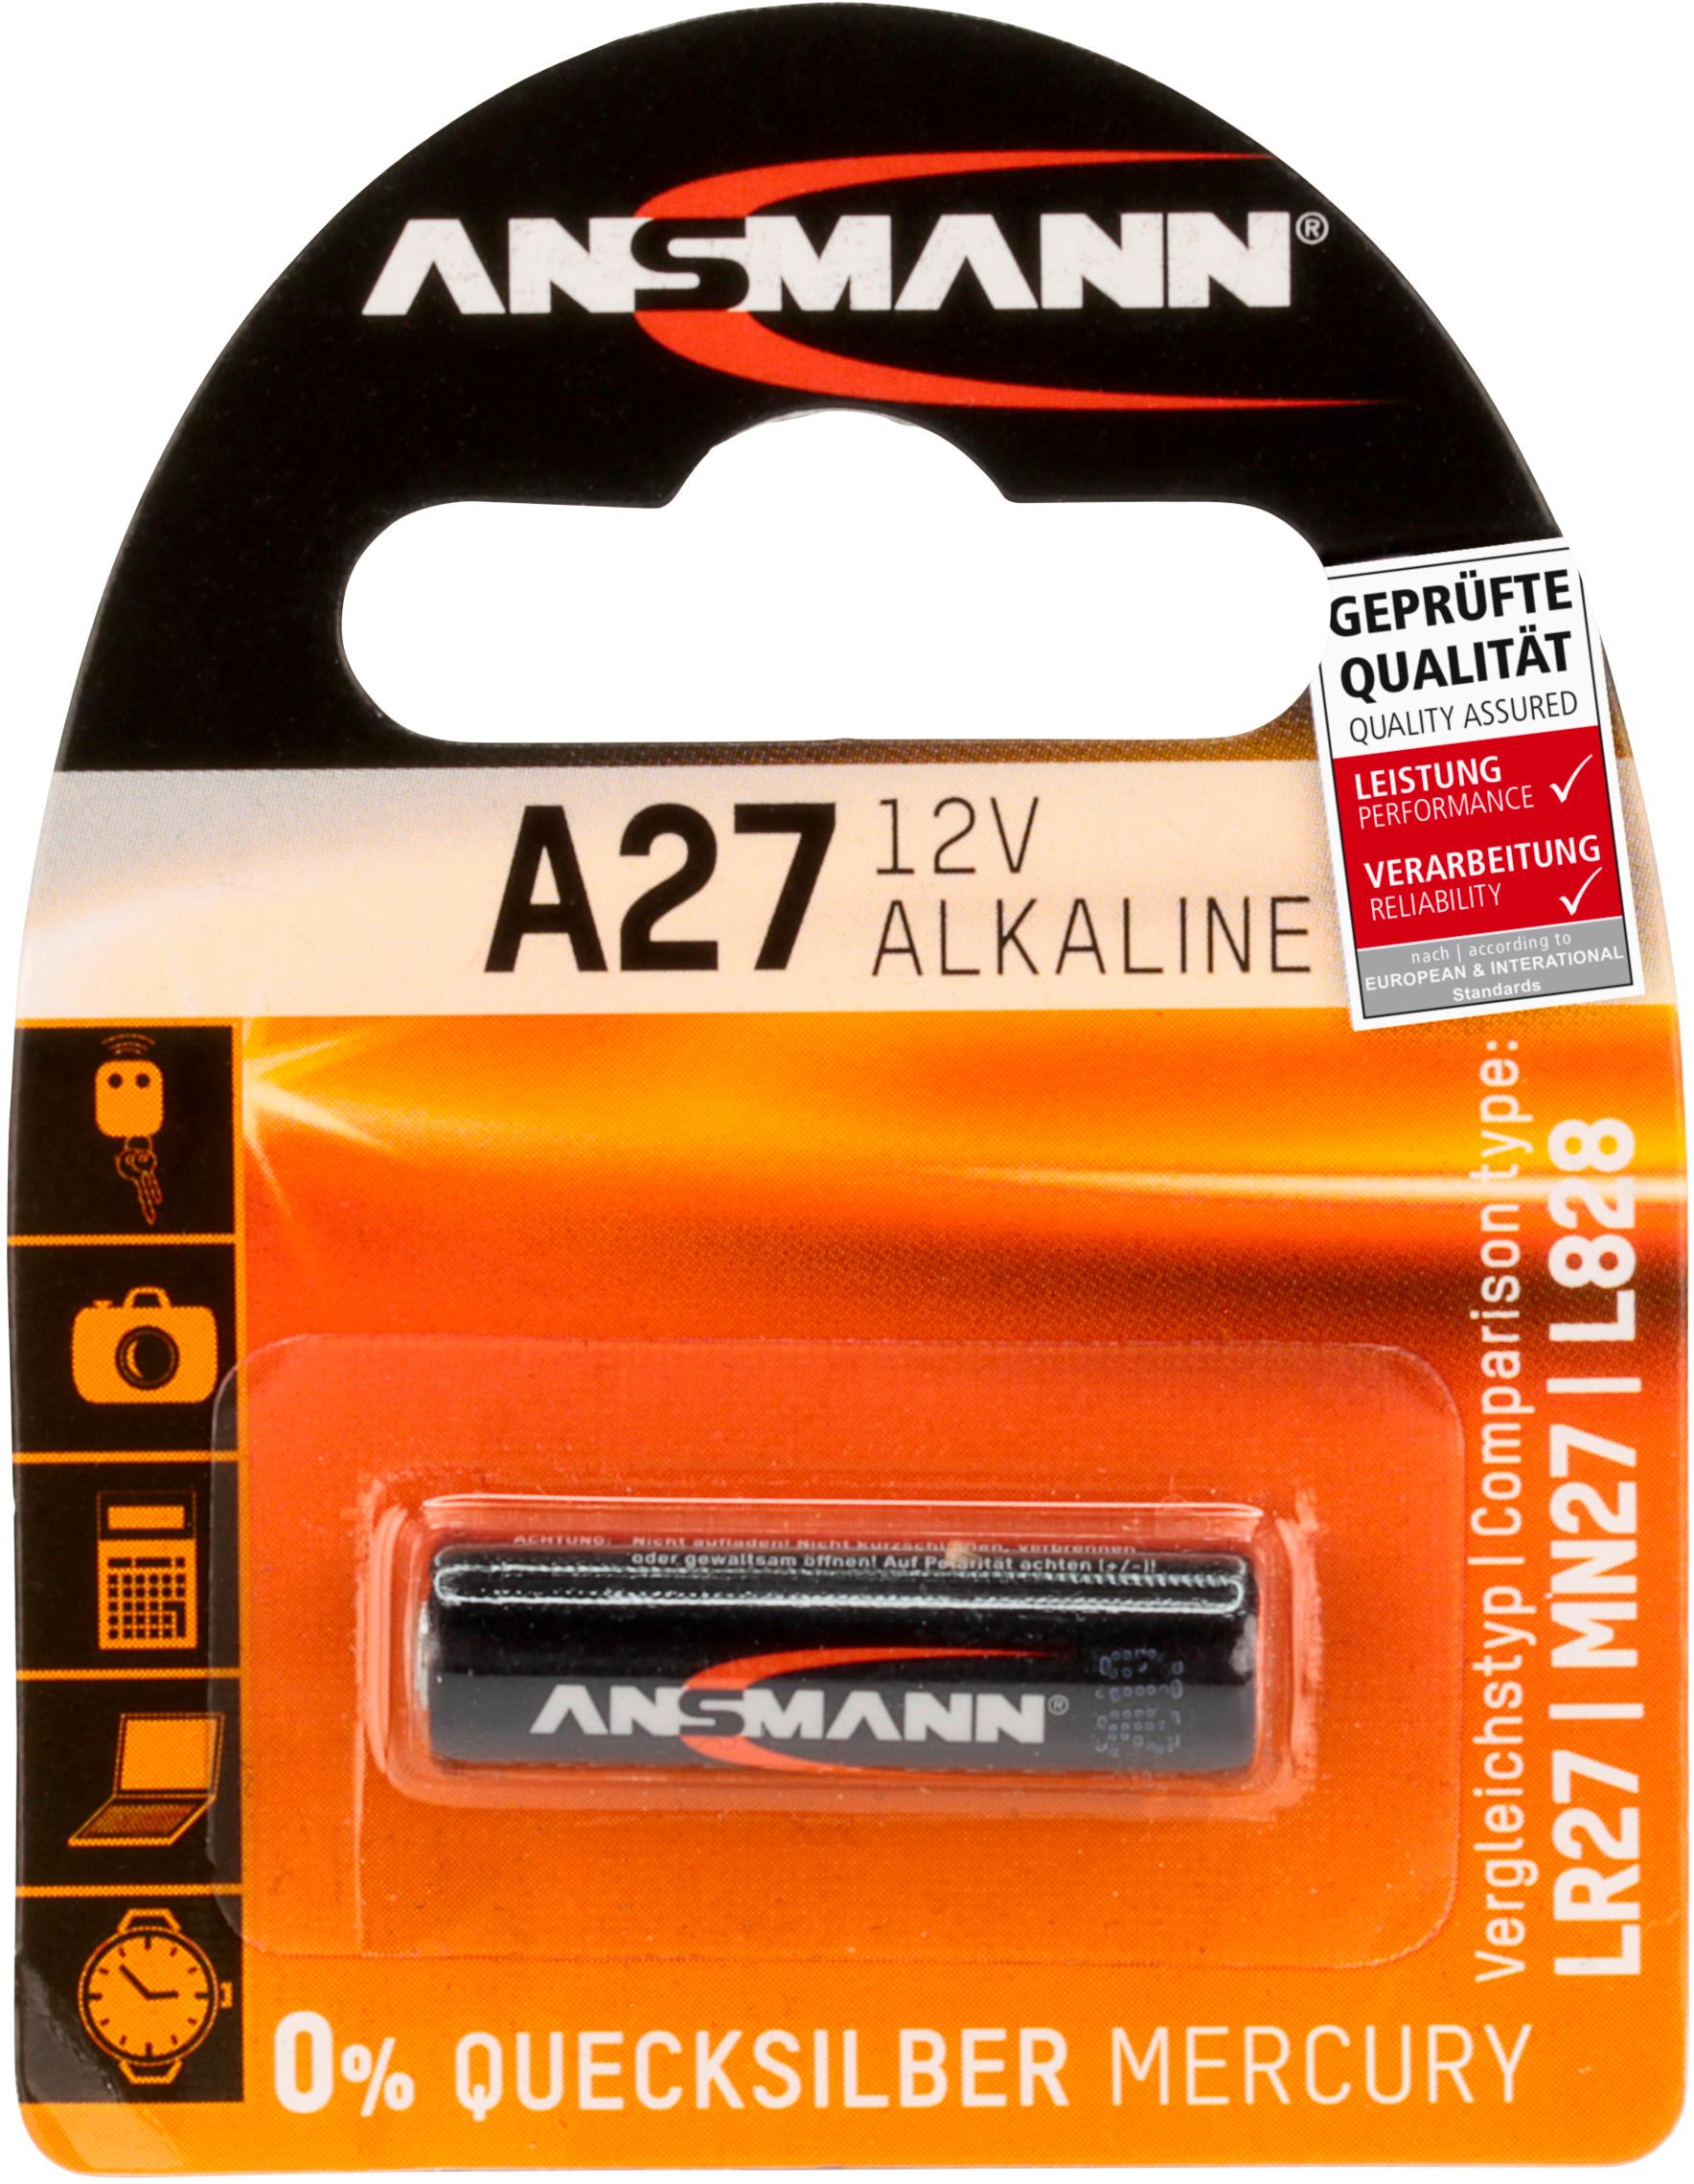 Ansmann A27